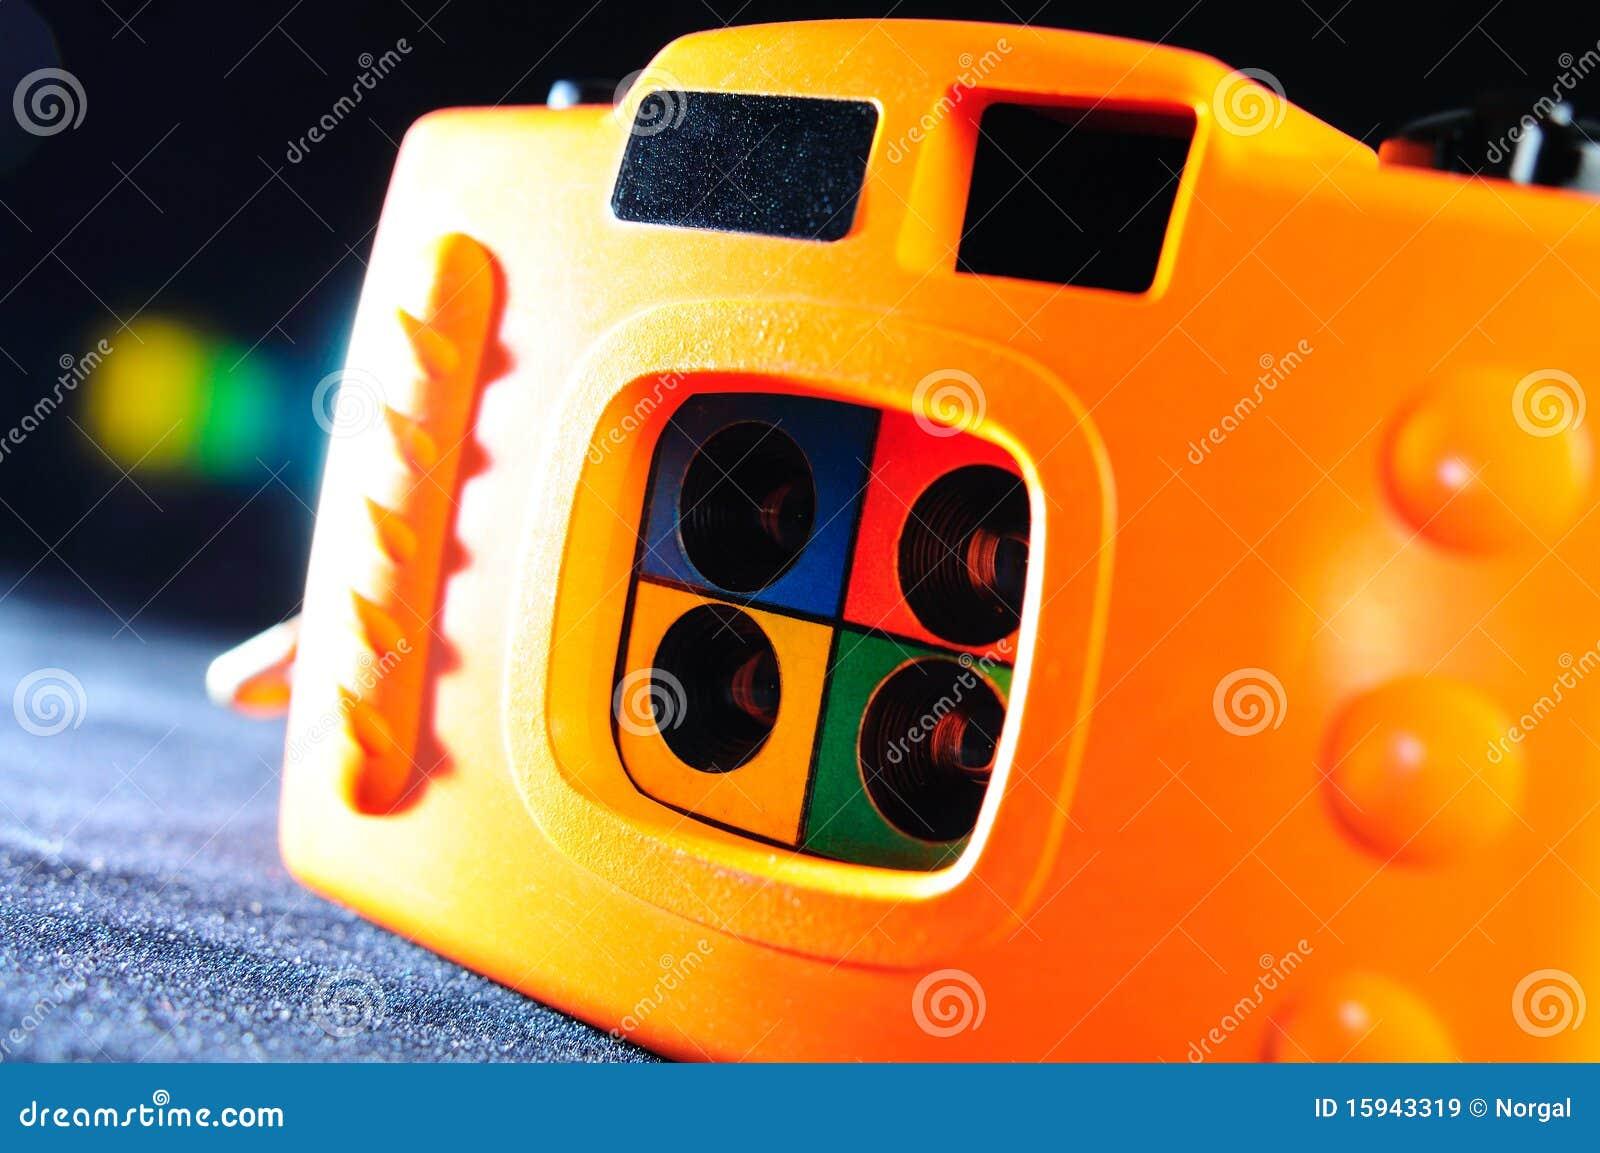 Orange 4-frame toy camera create 4 frame story in one shot.